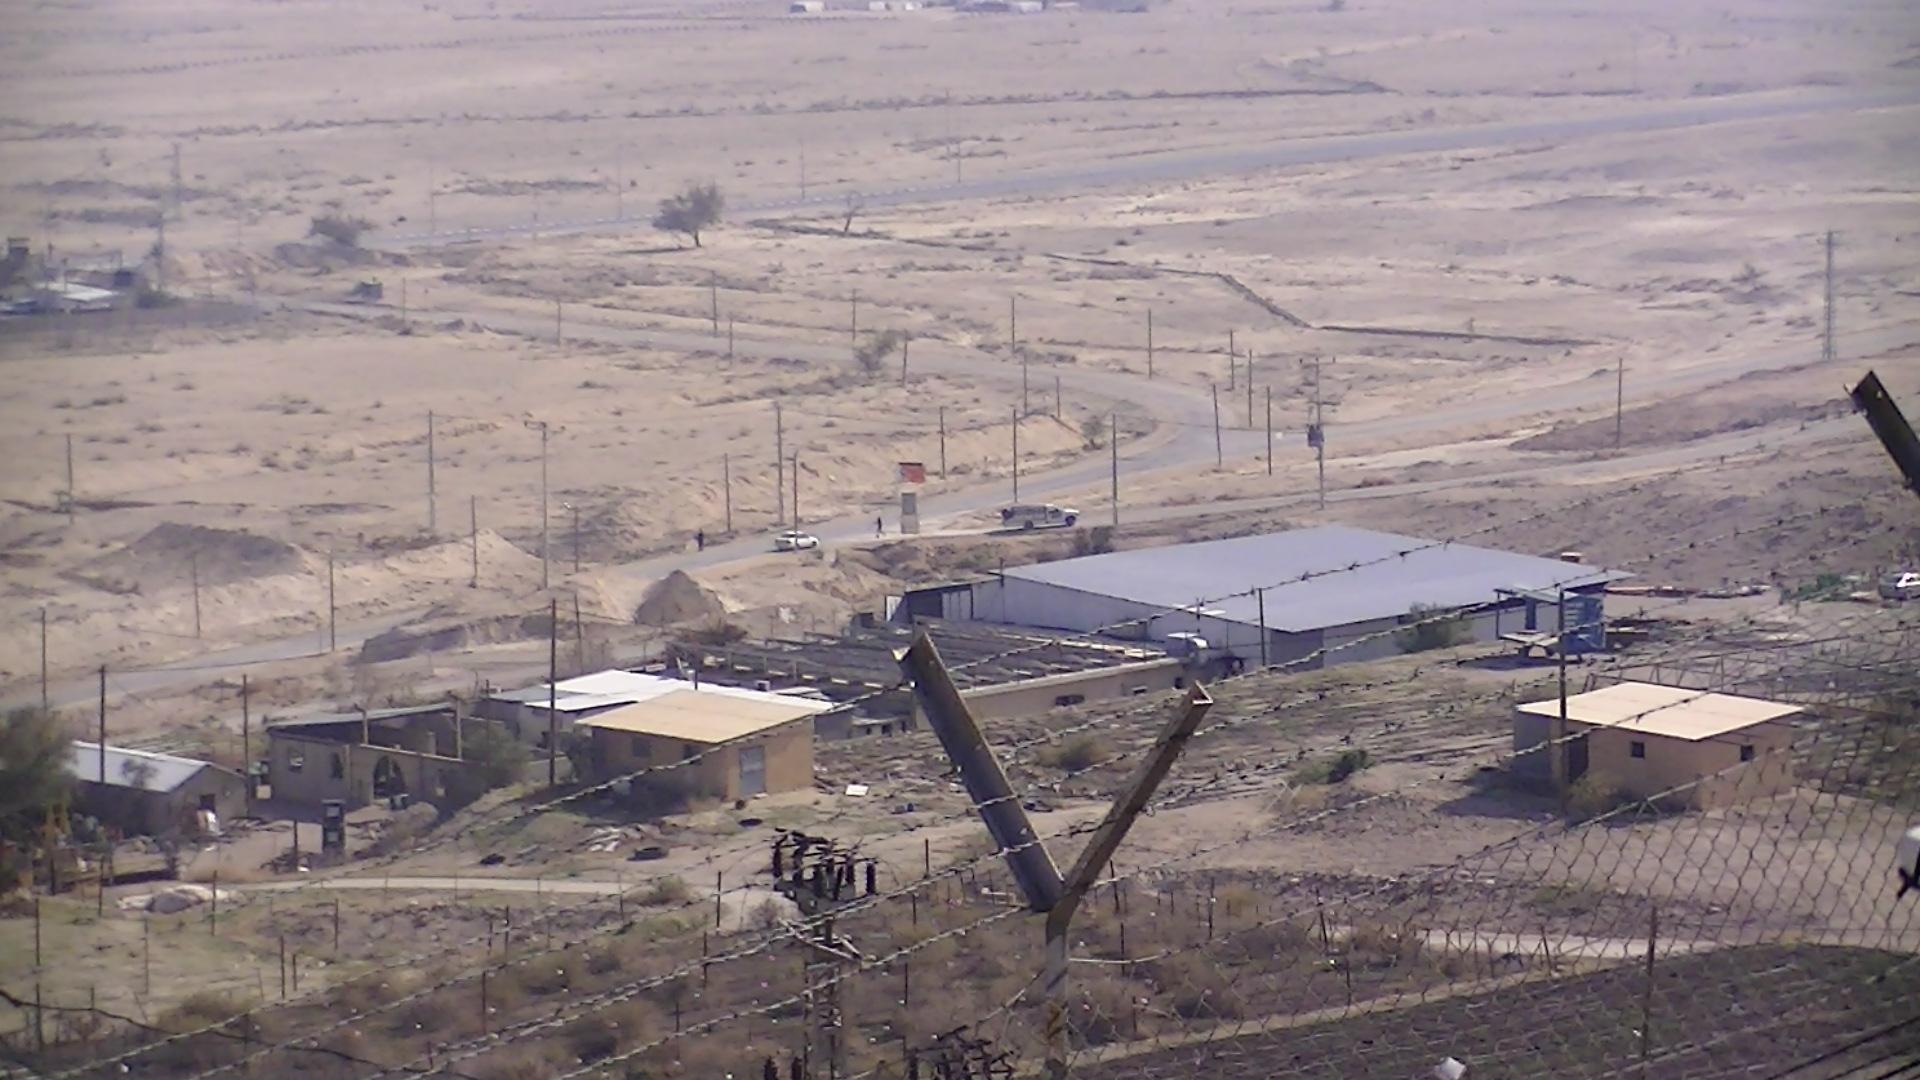 Agricultural fields of the illegal Israeli settlement of Vered Yeriho